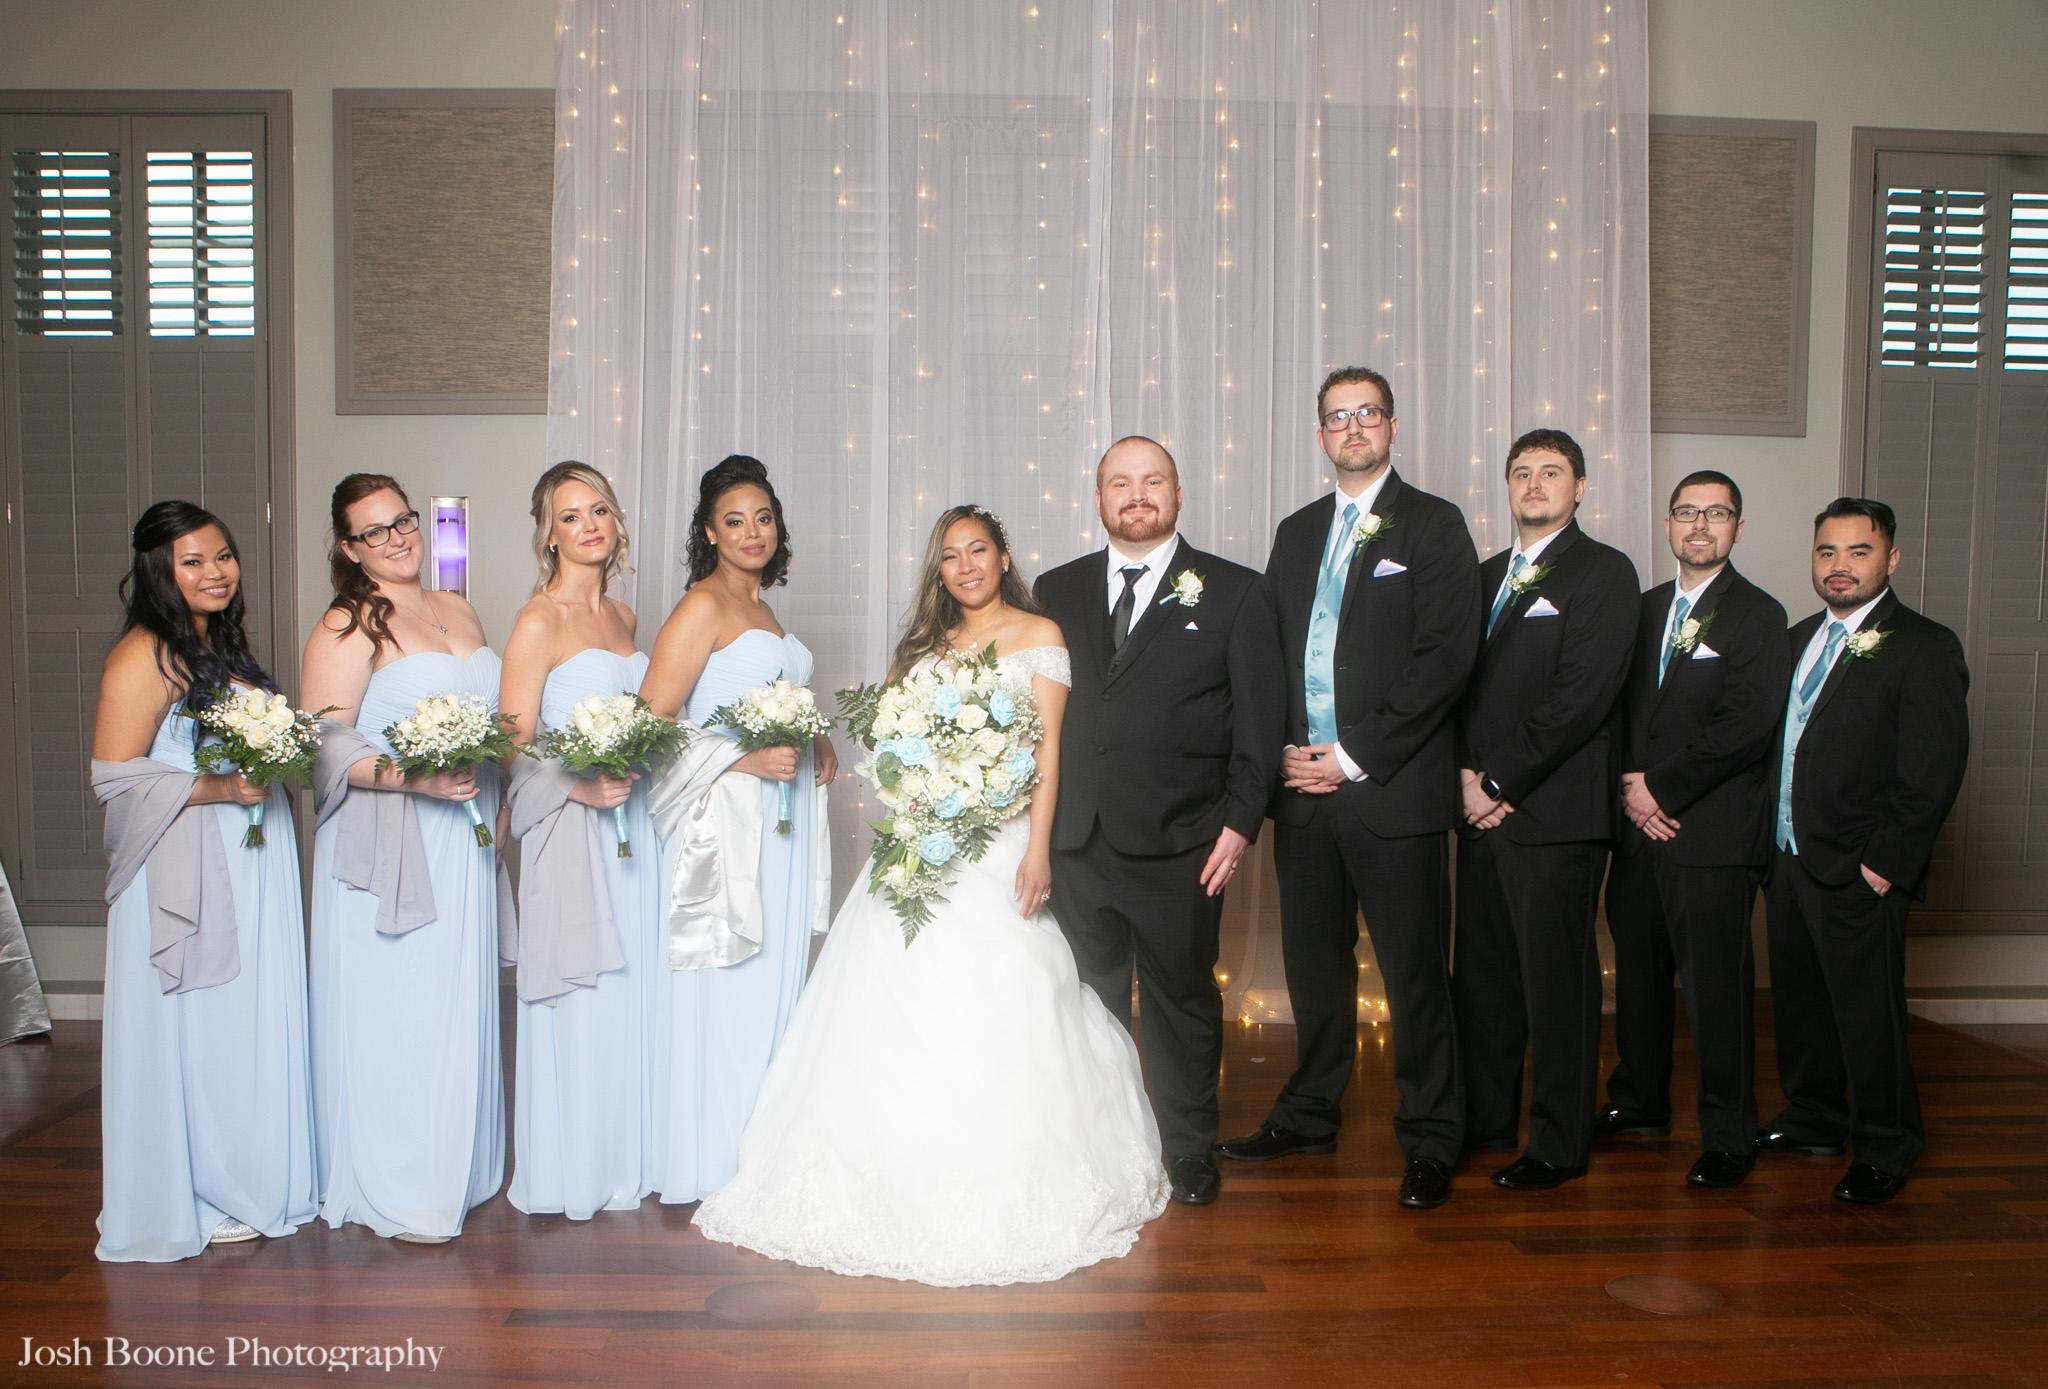 noahs_event_venue_wedding-54.jpg